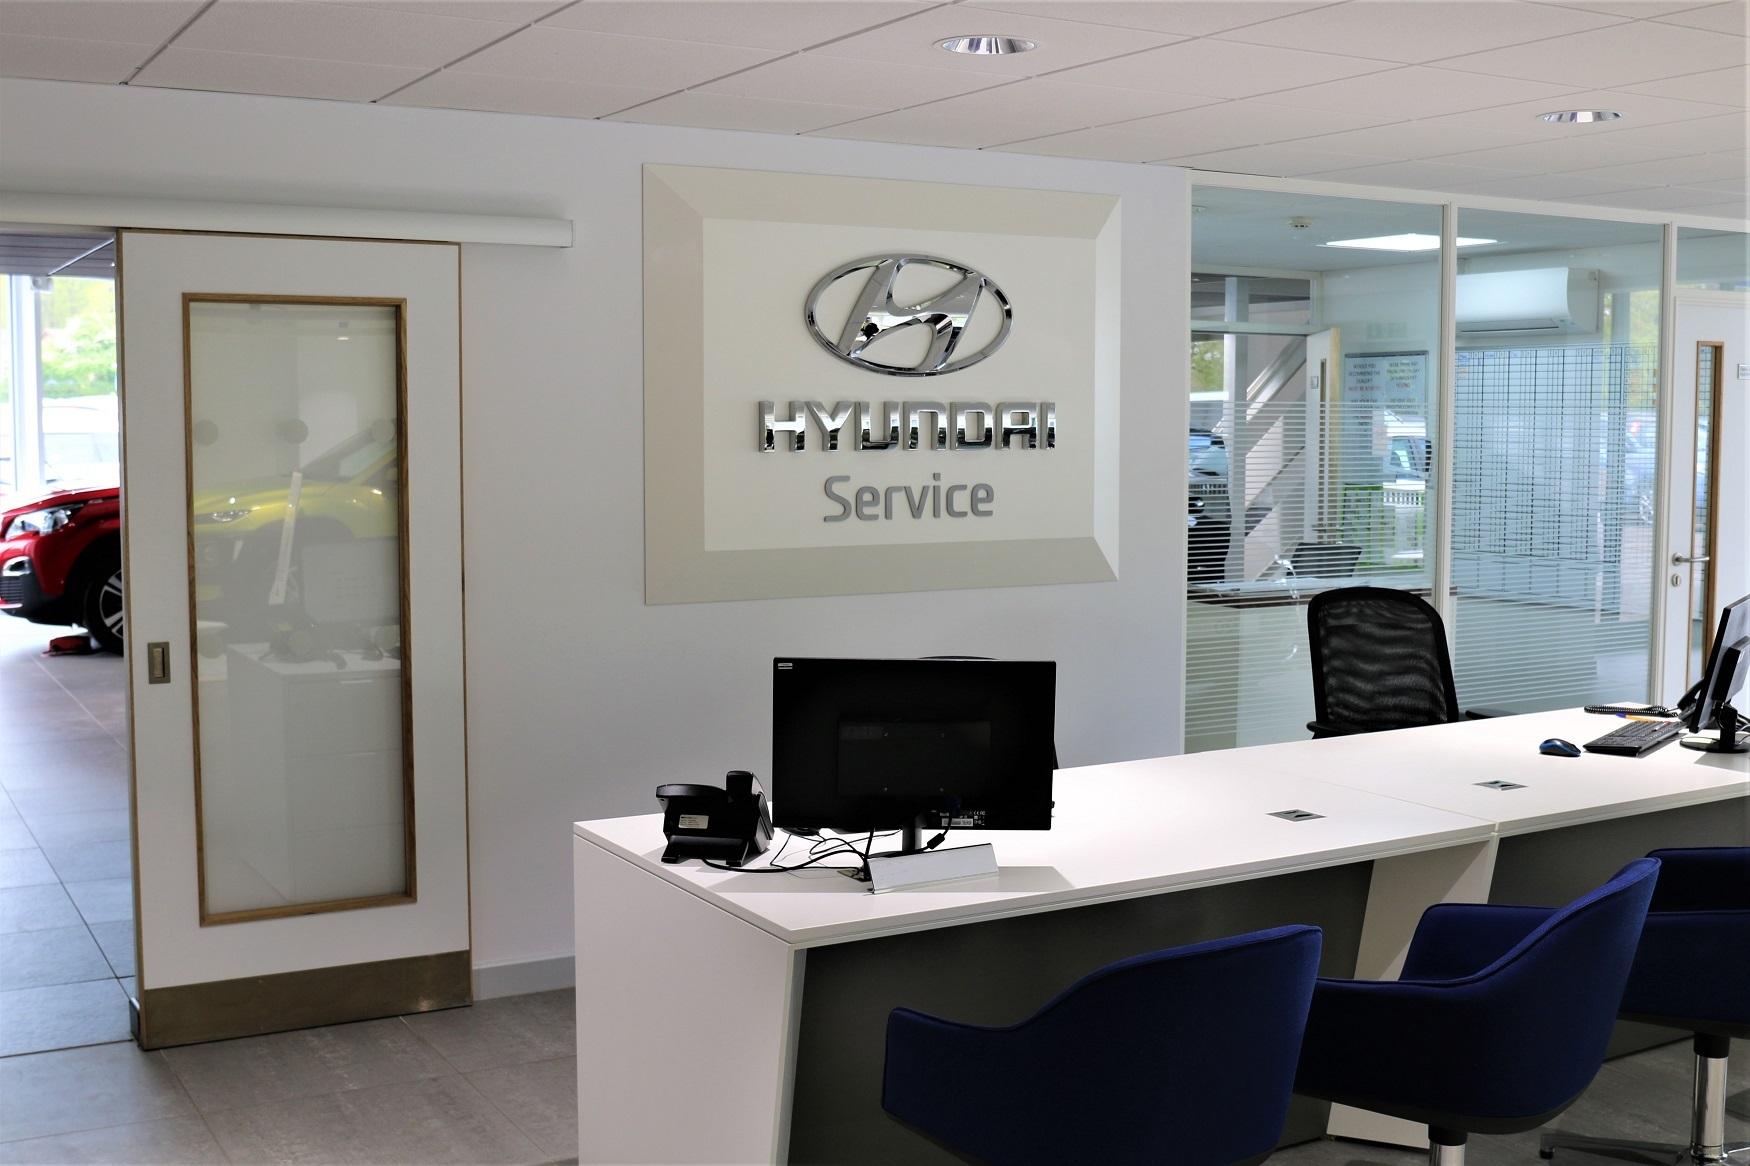 Hyundai service reception desk to match branding